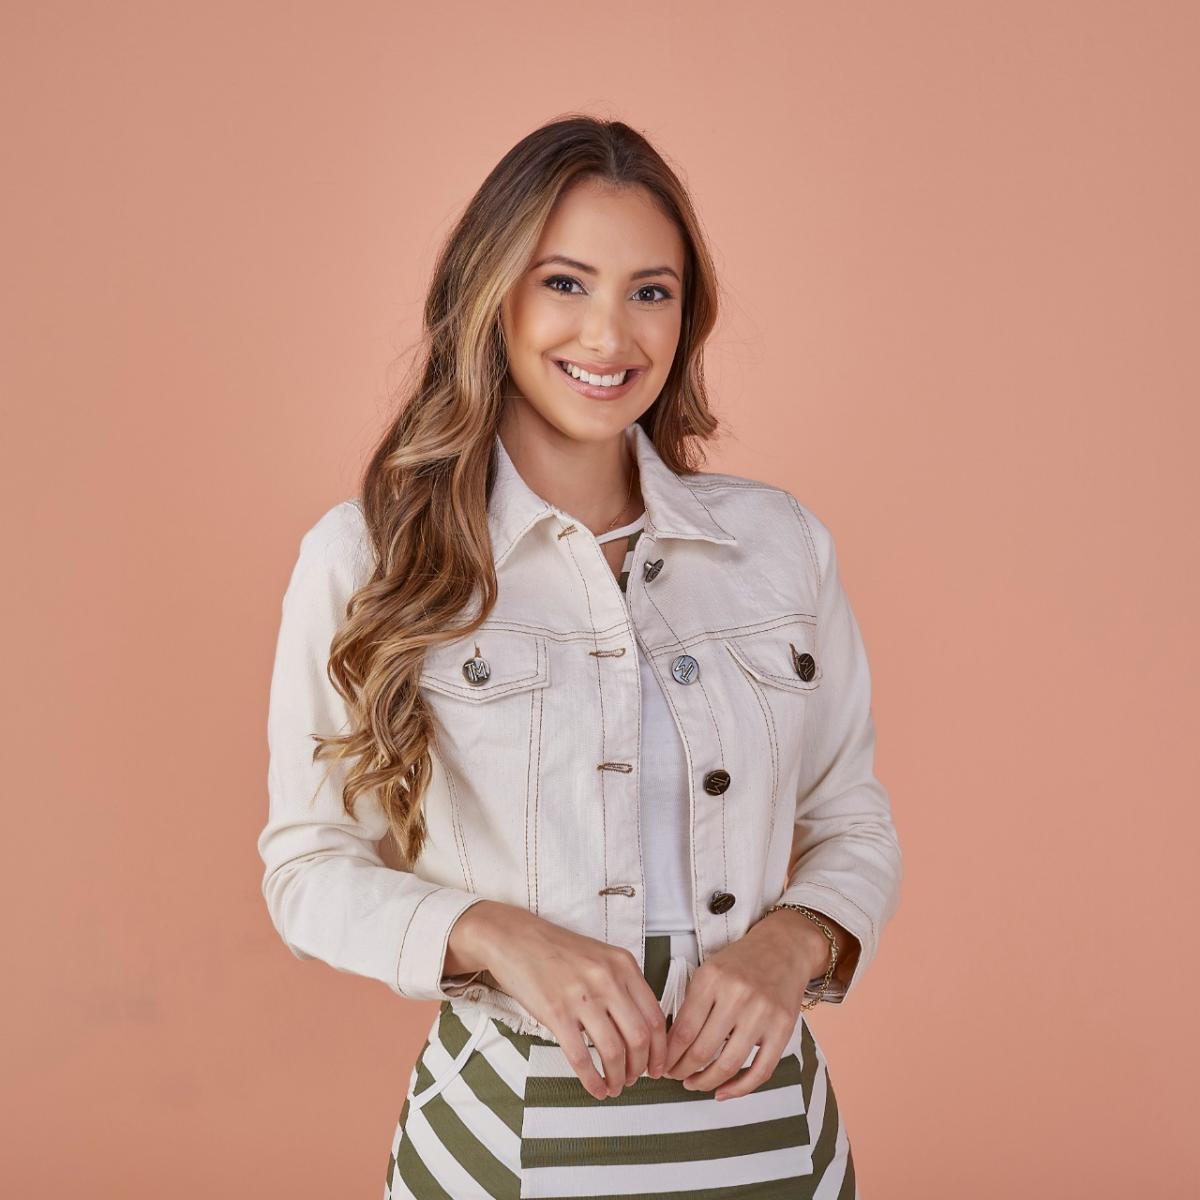 Jaqueta Jeans Brenda, Moda Evangélica - Tatá Martello